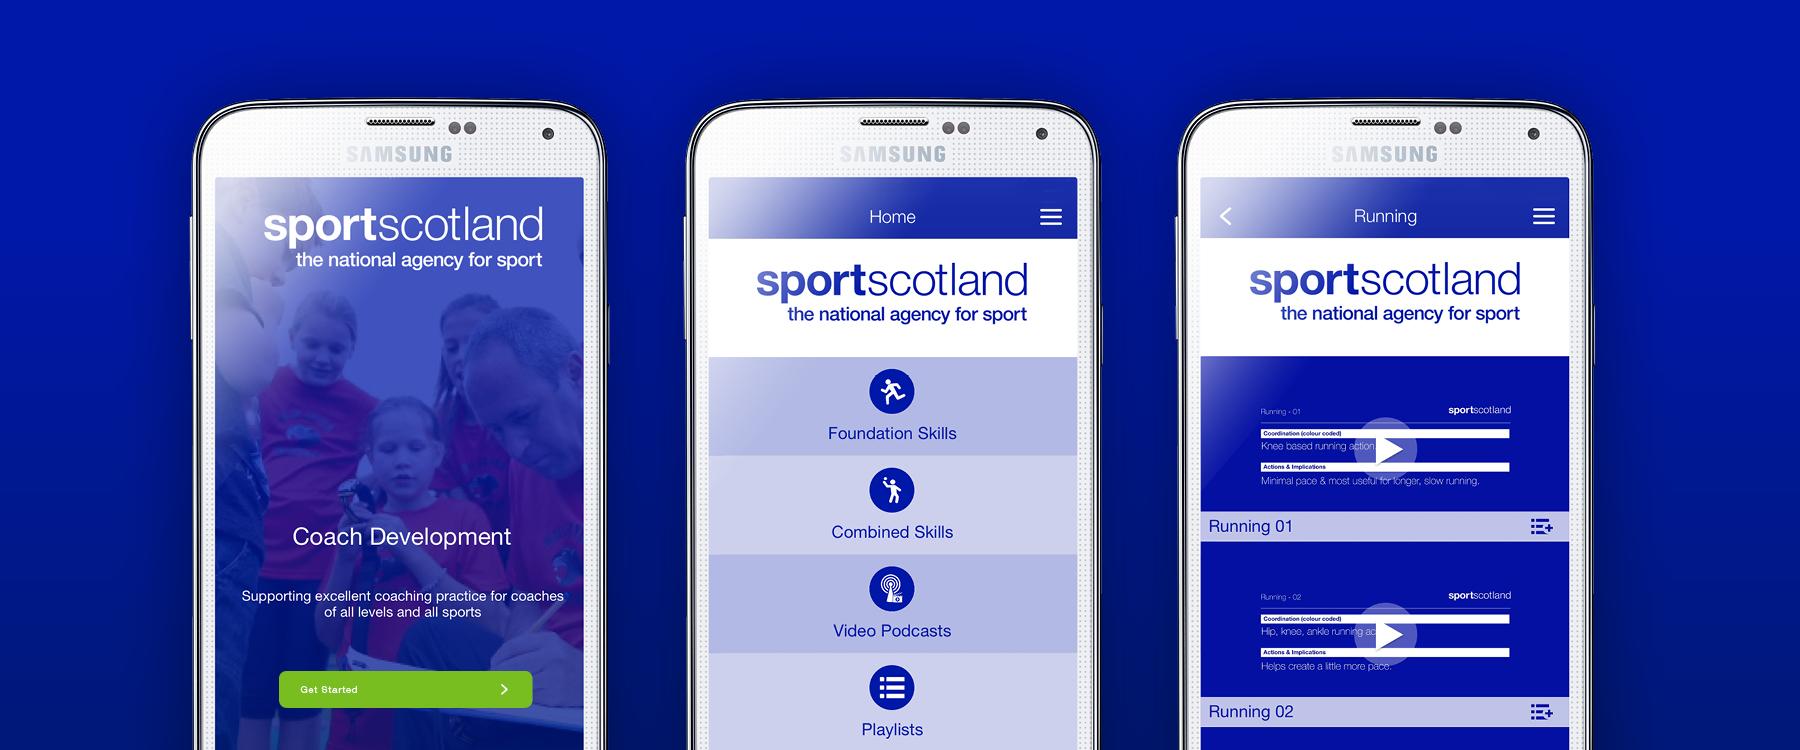 SportScotland App 1800x750 Main Image